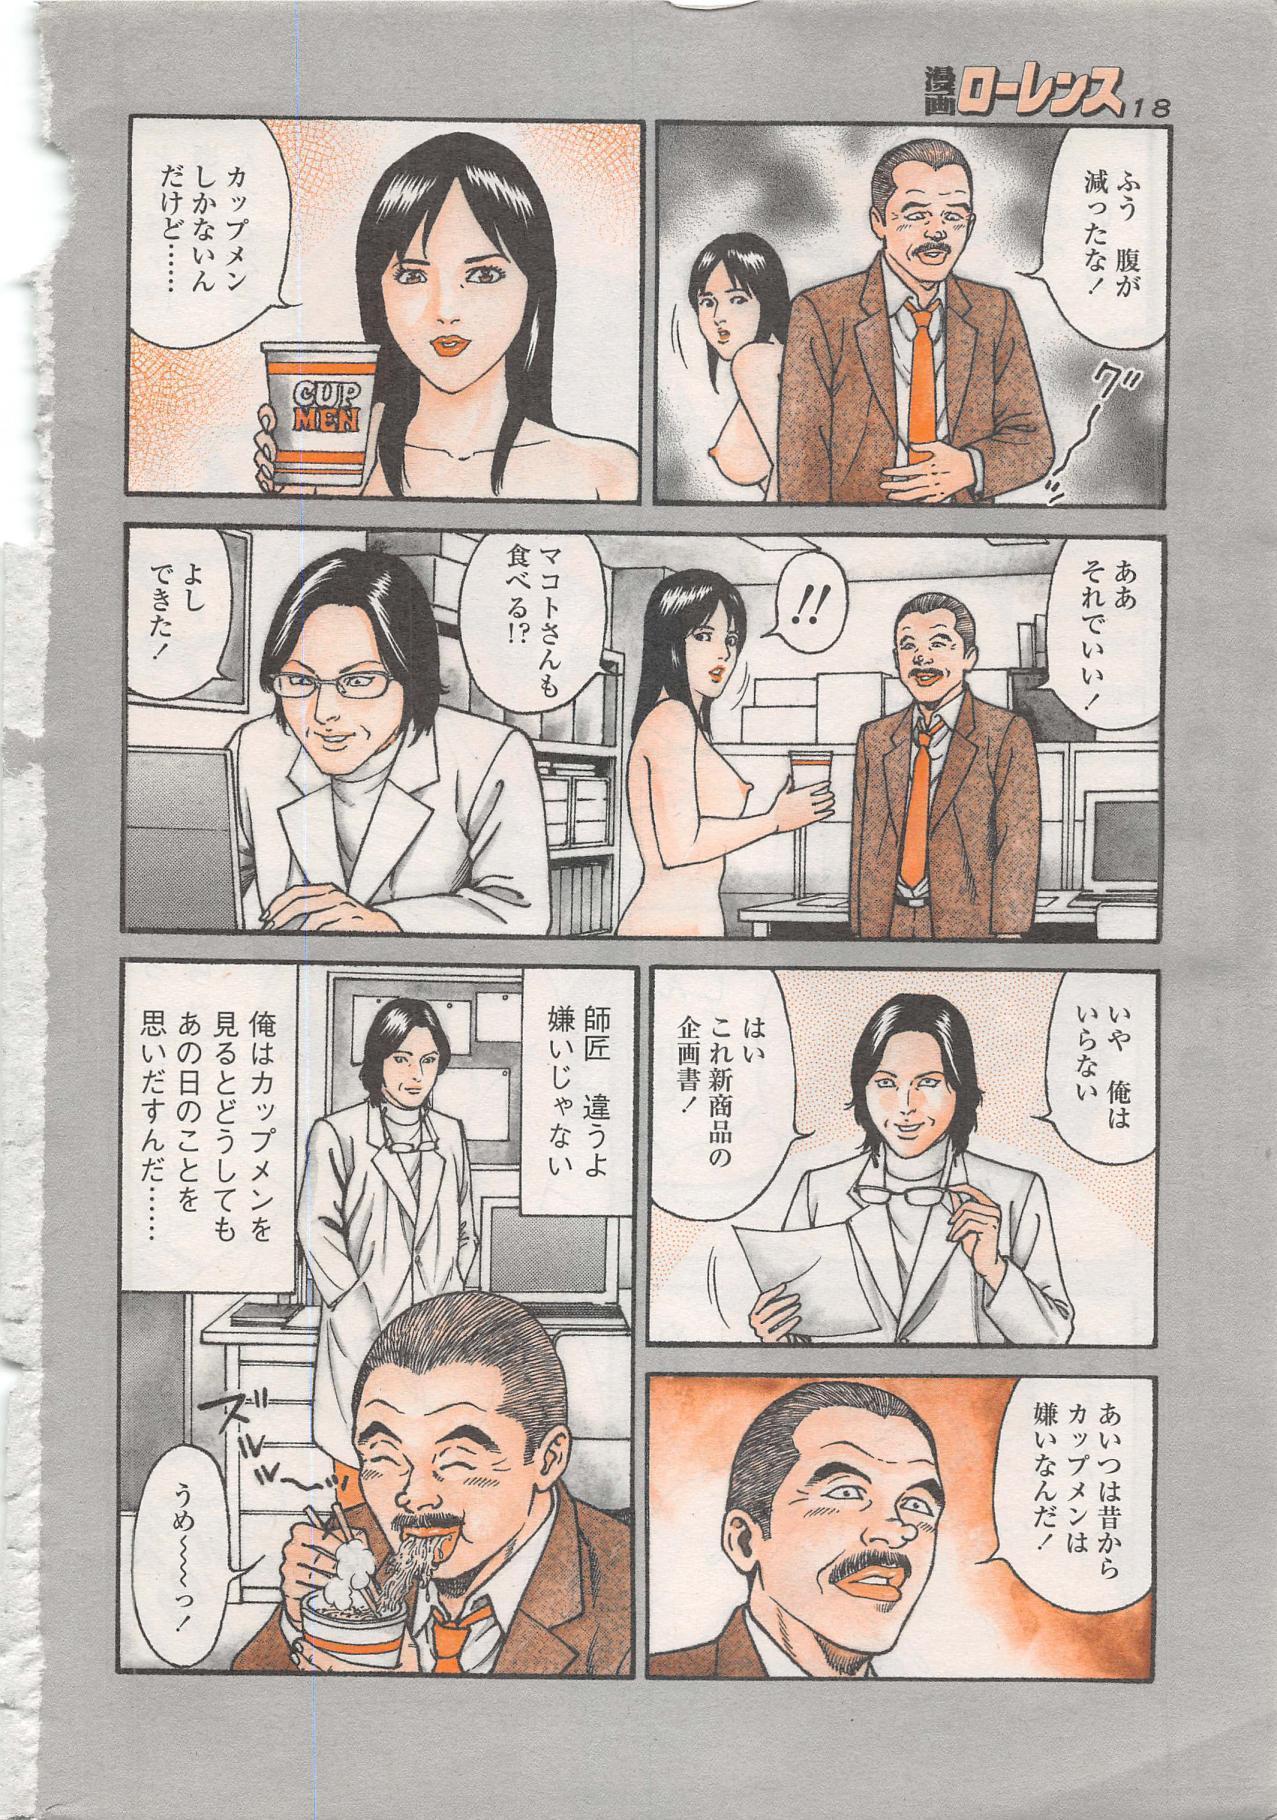 Manga Lawrence 2013-04 5